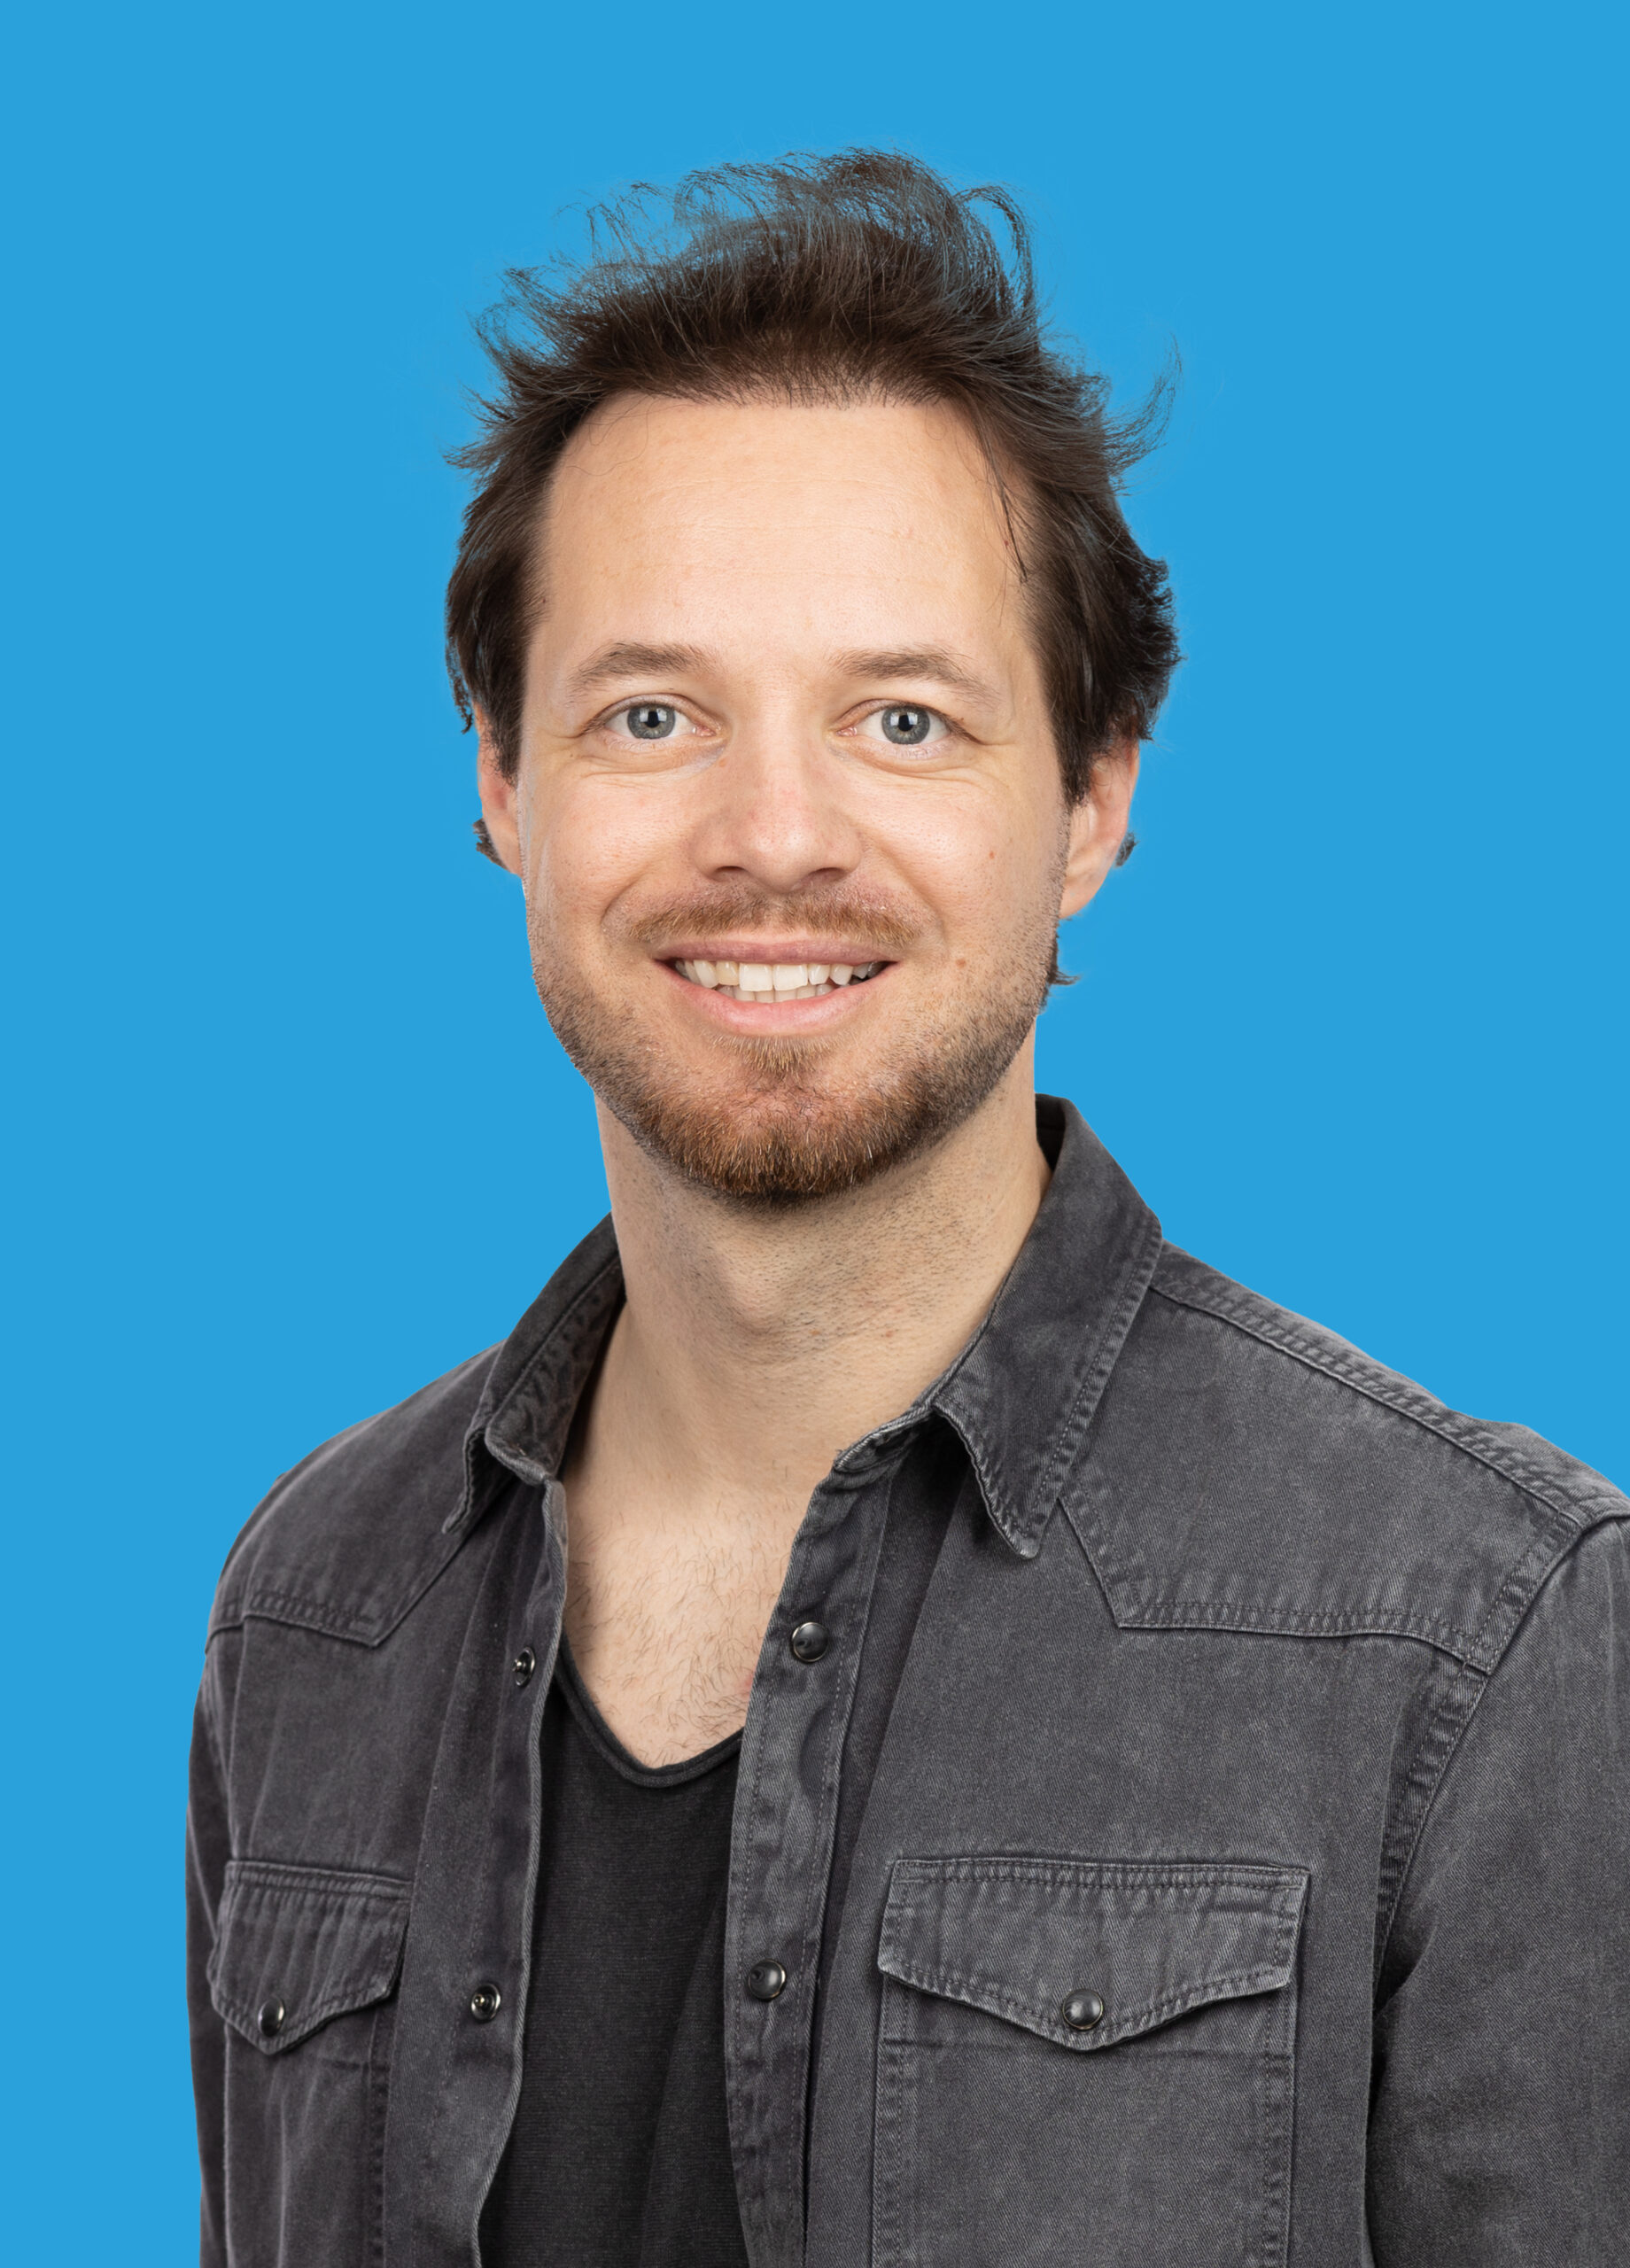 Andreas Rohner